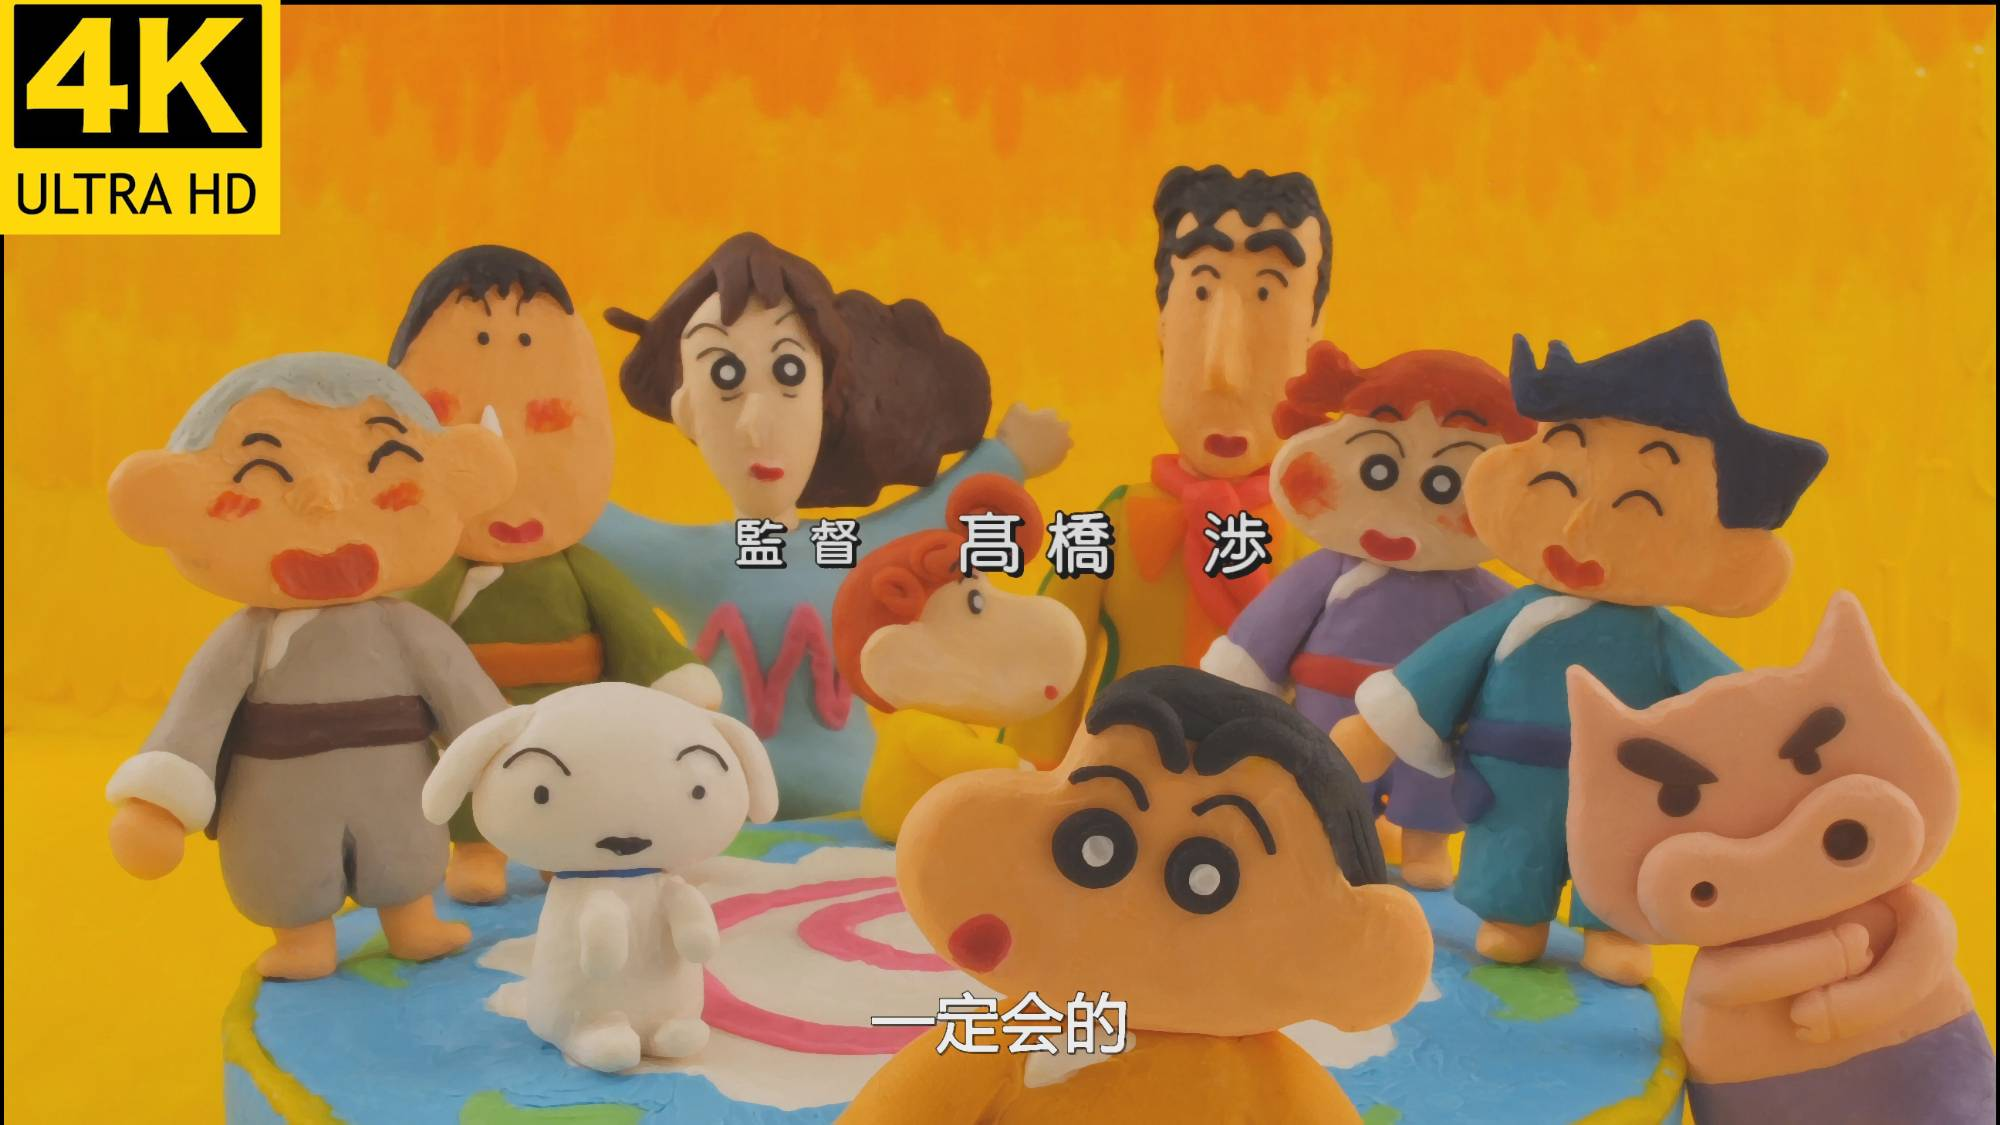 【4k60帧】童年动漫歌曲大放送来了